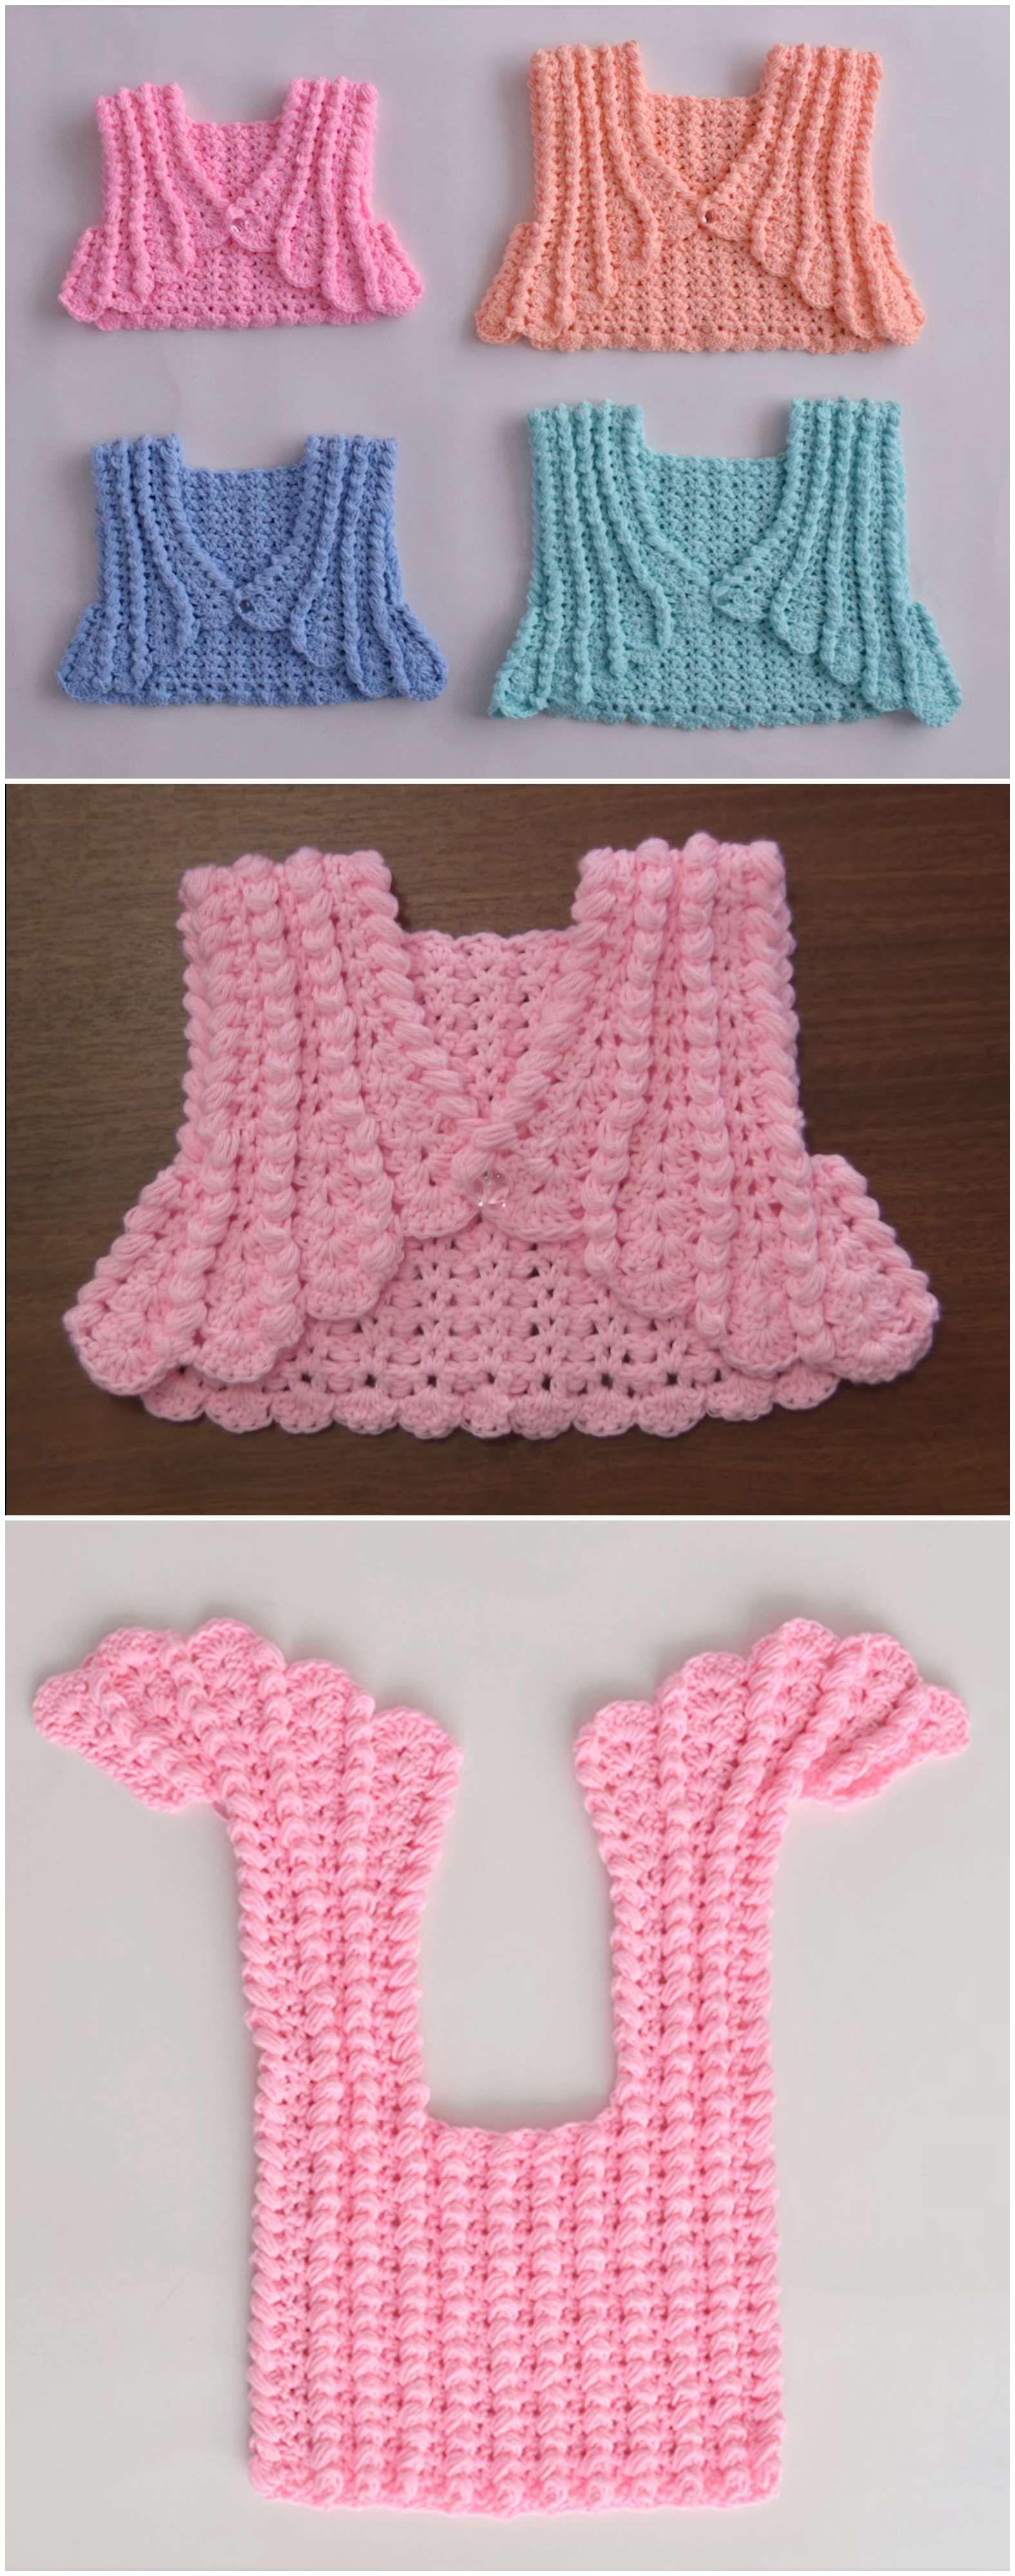 Crochet Pretty Bolero for Babies   Pinterest   Boleros, Crochet and ...